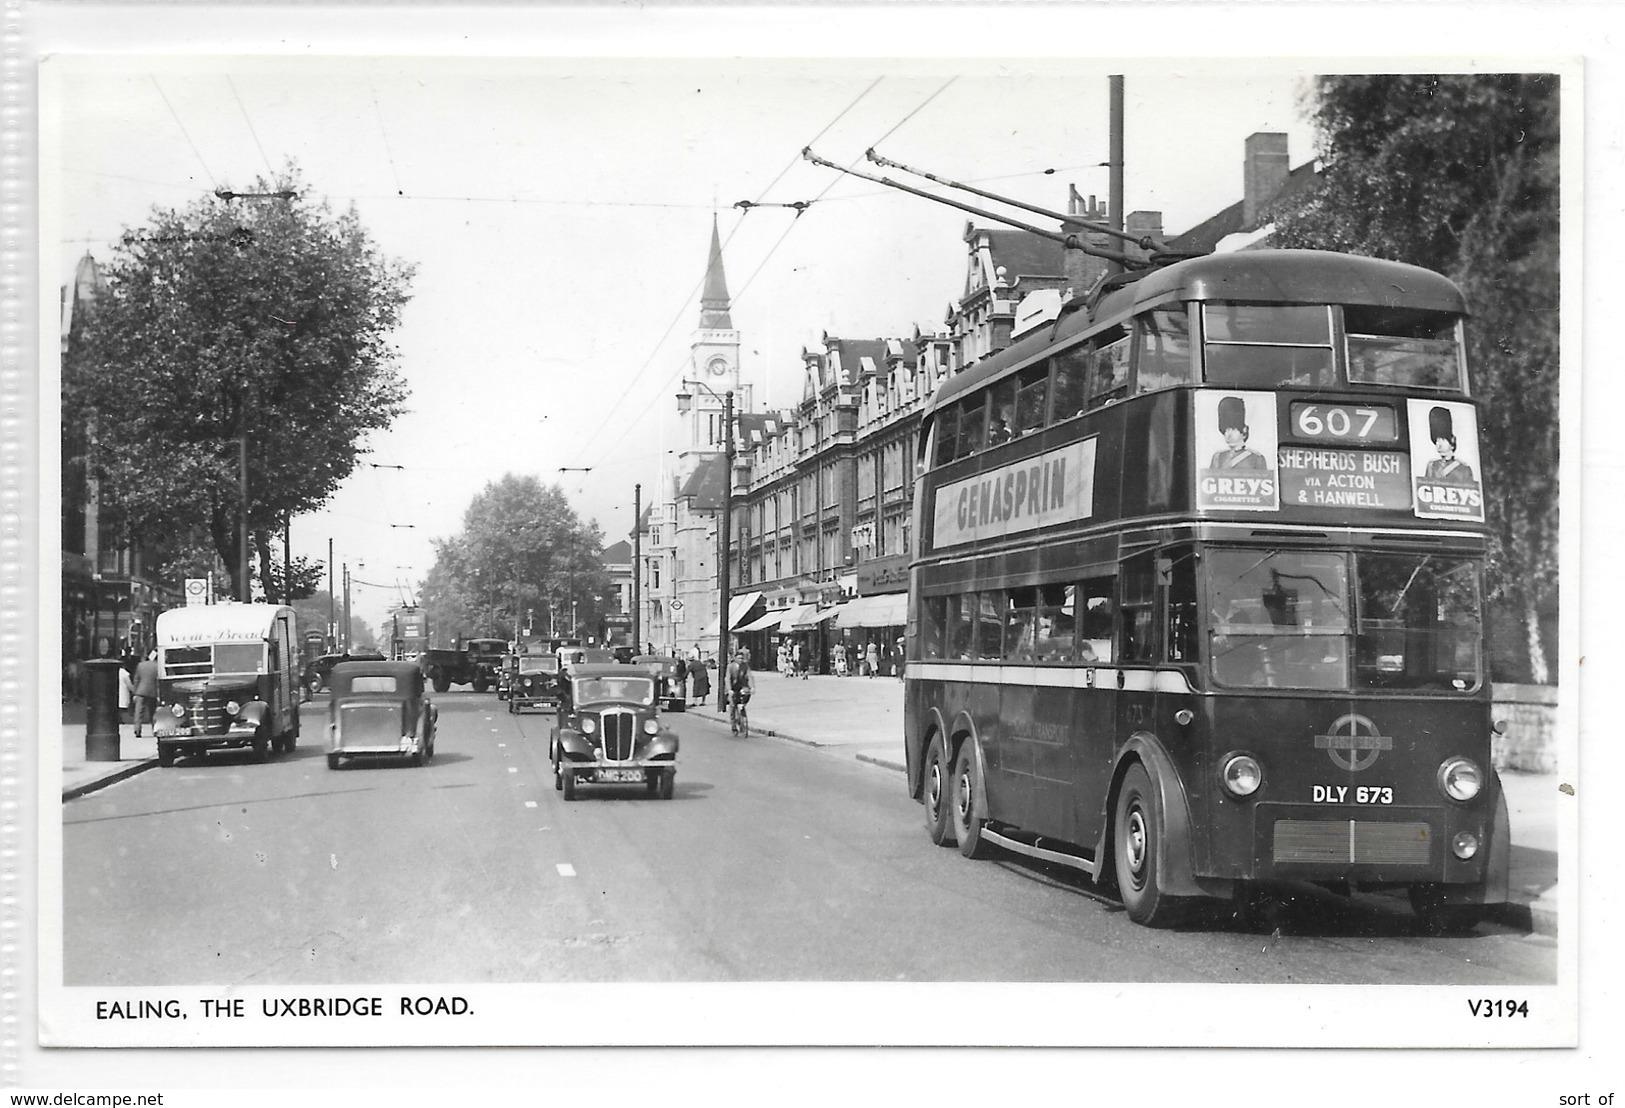 RP - EALING - THE UXBRIDGE ROAD - S930 - London Suburbs